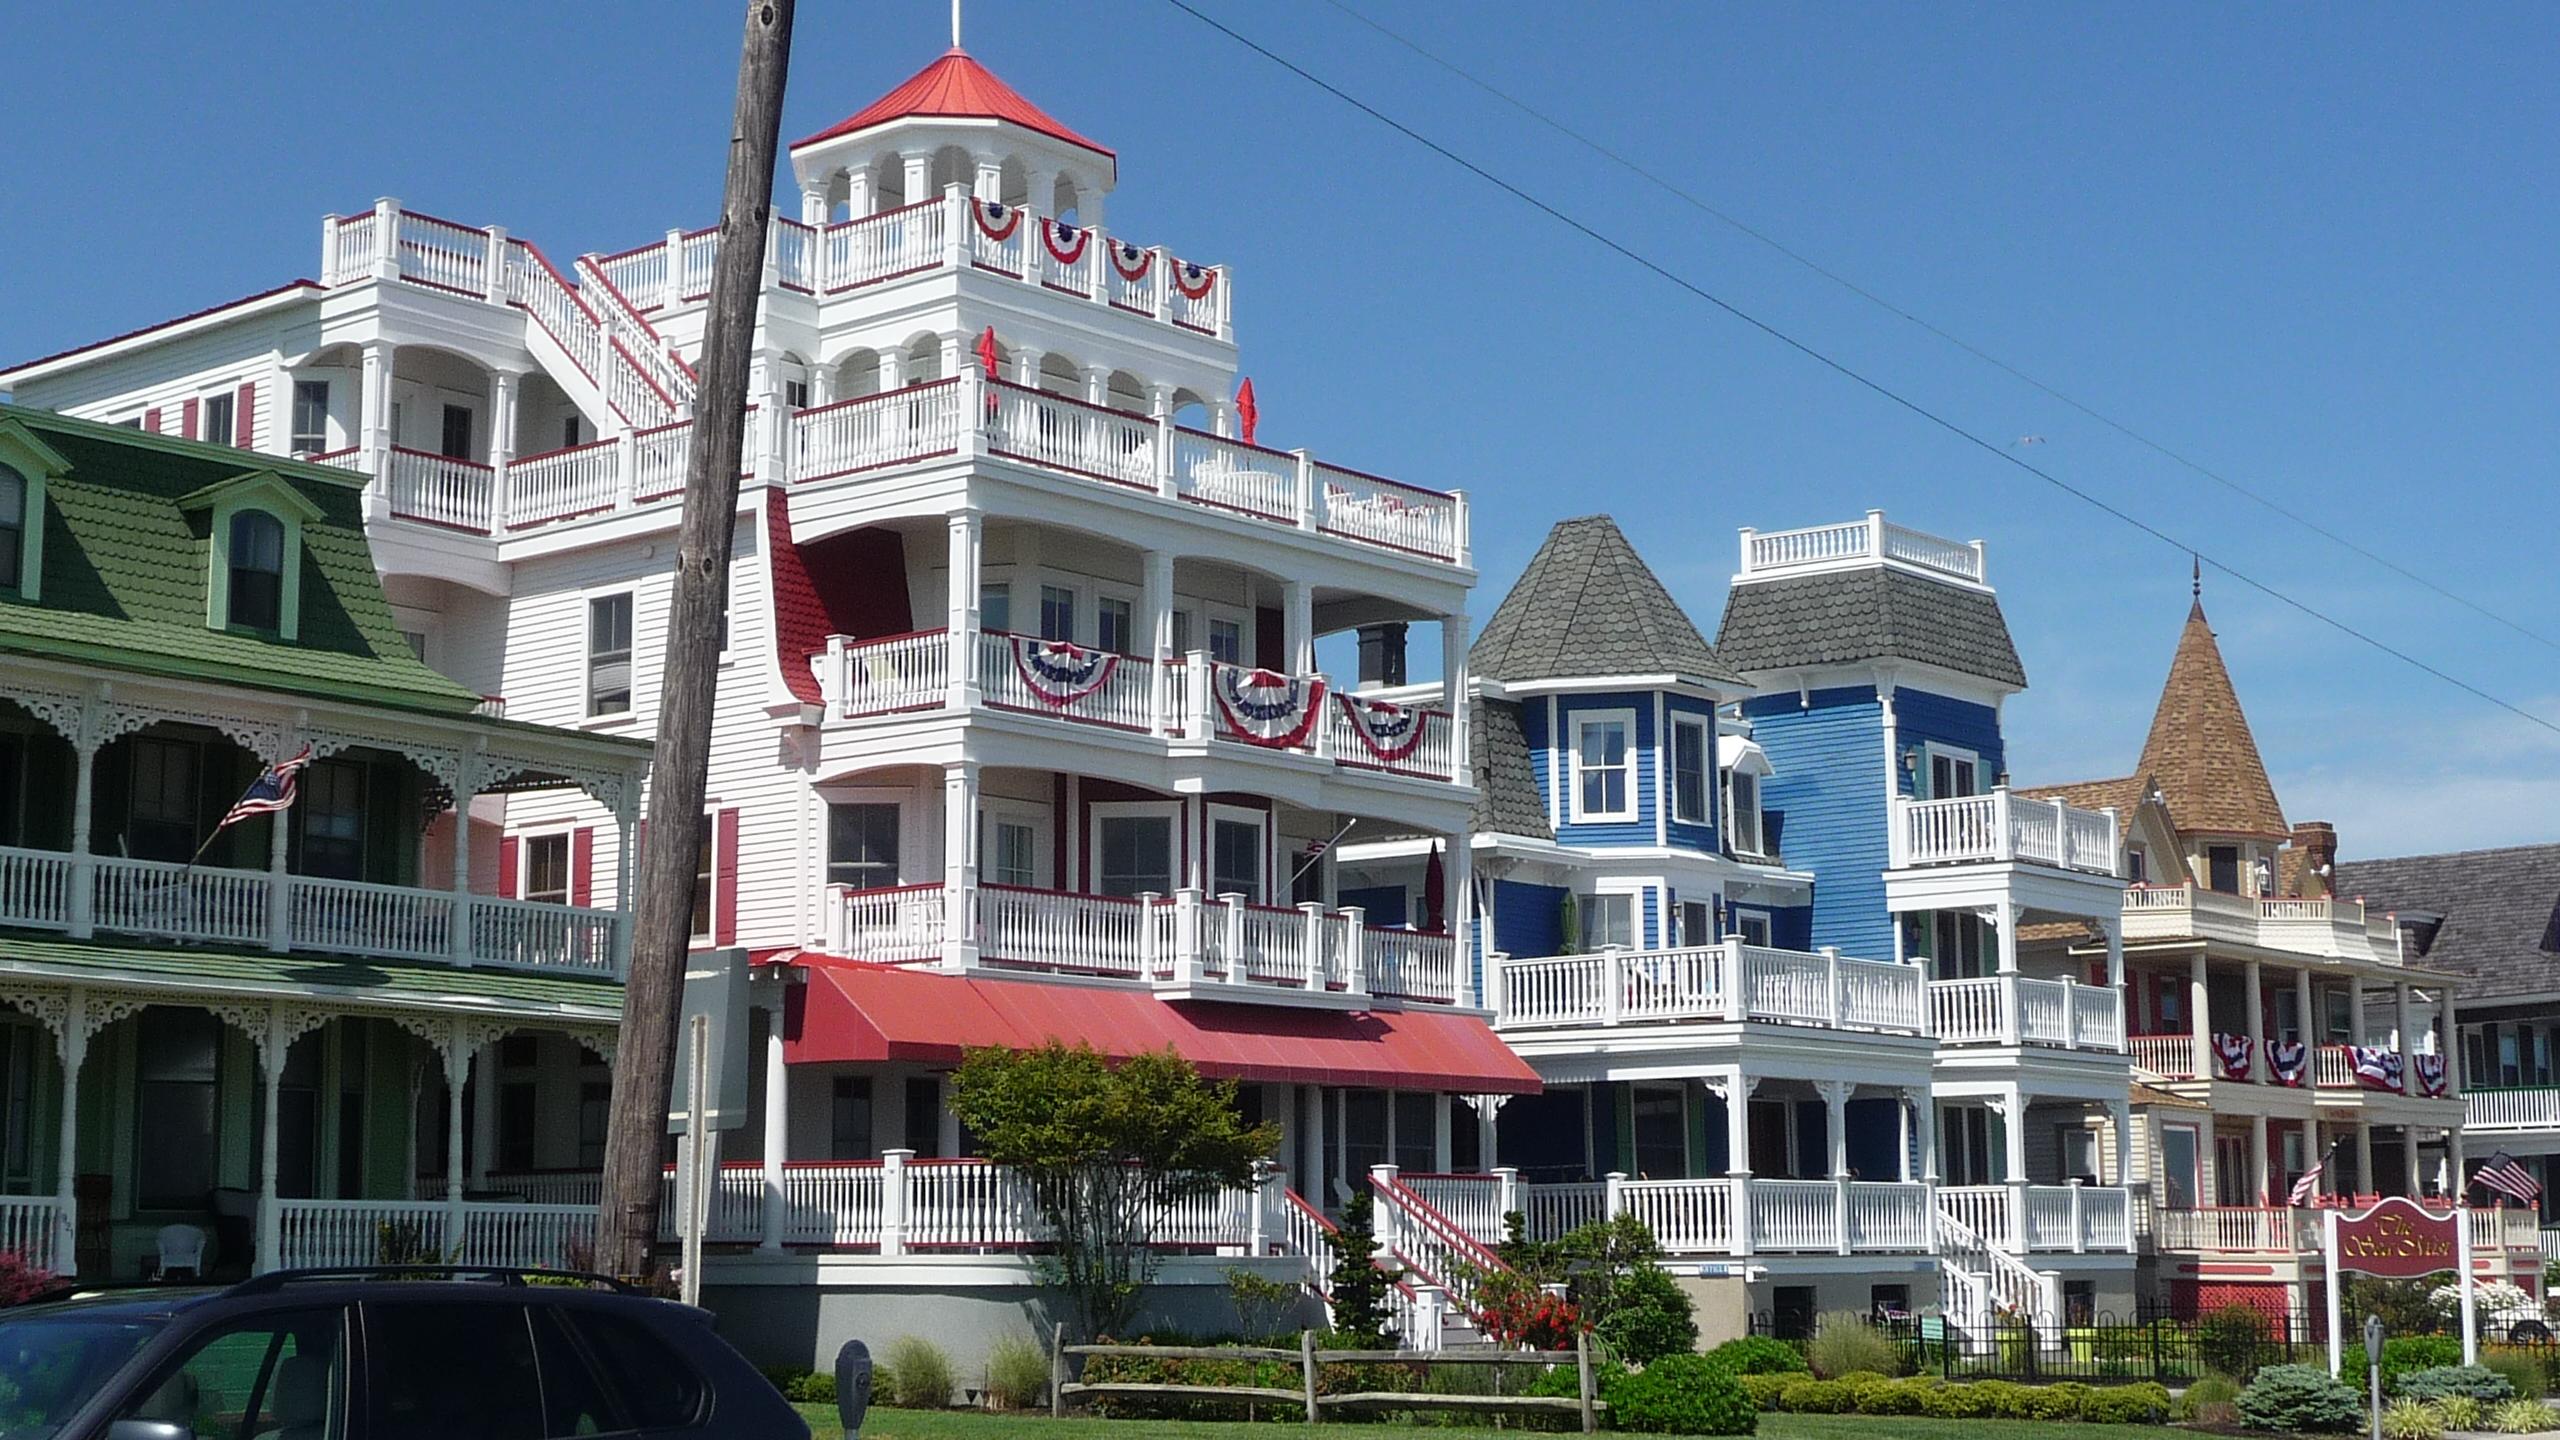 ... Homes & Plantation & Colonial Homes/Decor | Pinterest | Capes